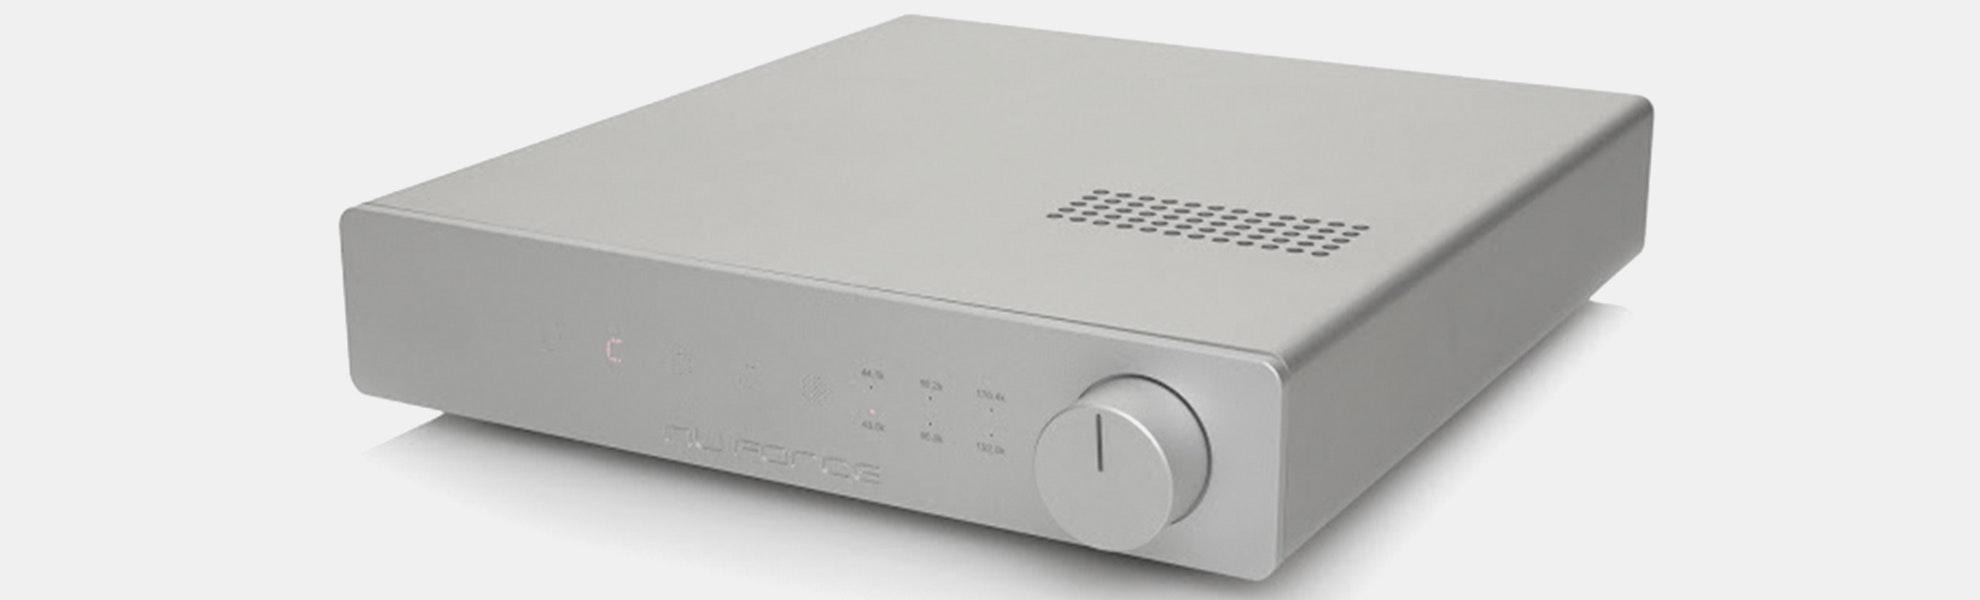 NuForce DAC80